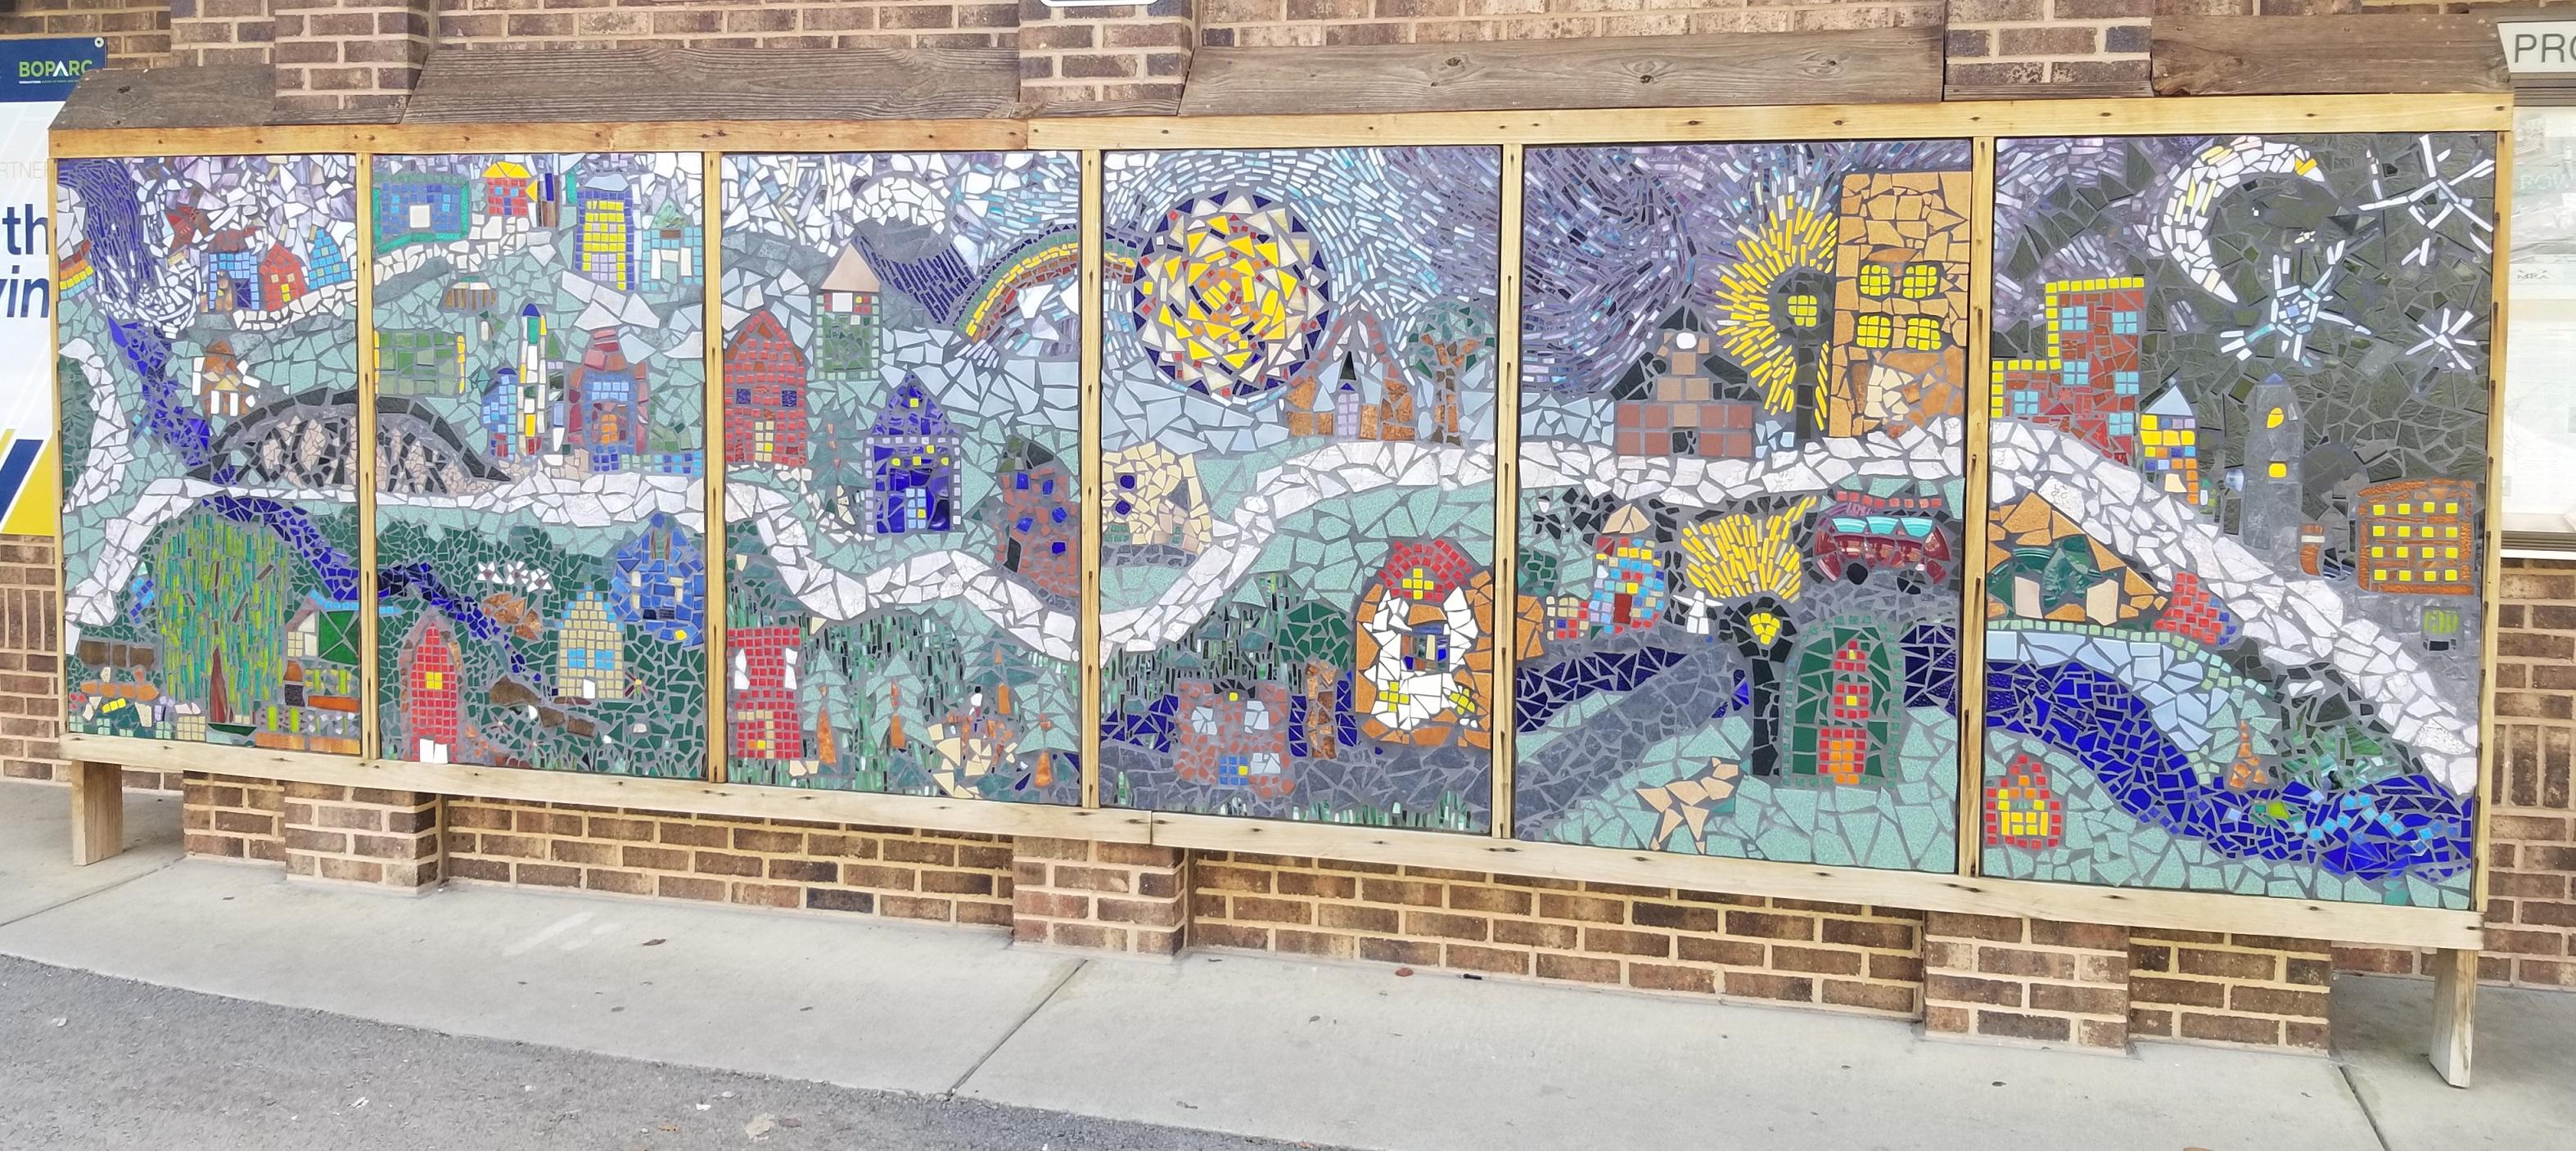 Full mosaic, all 6 panels.